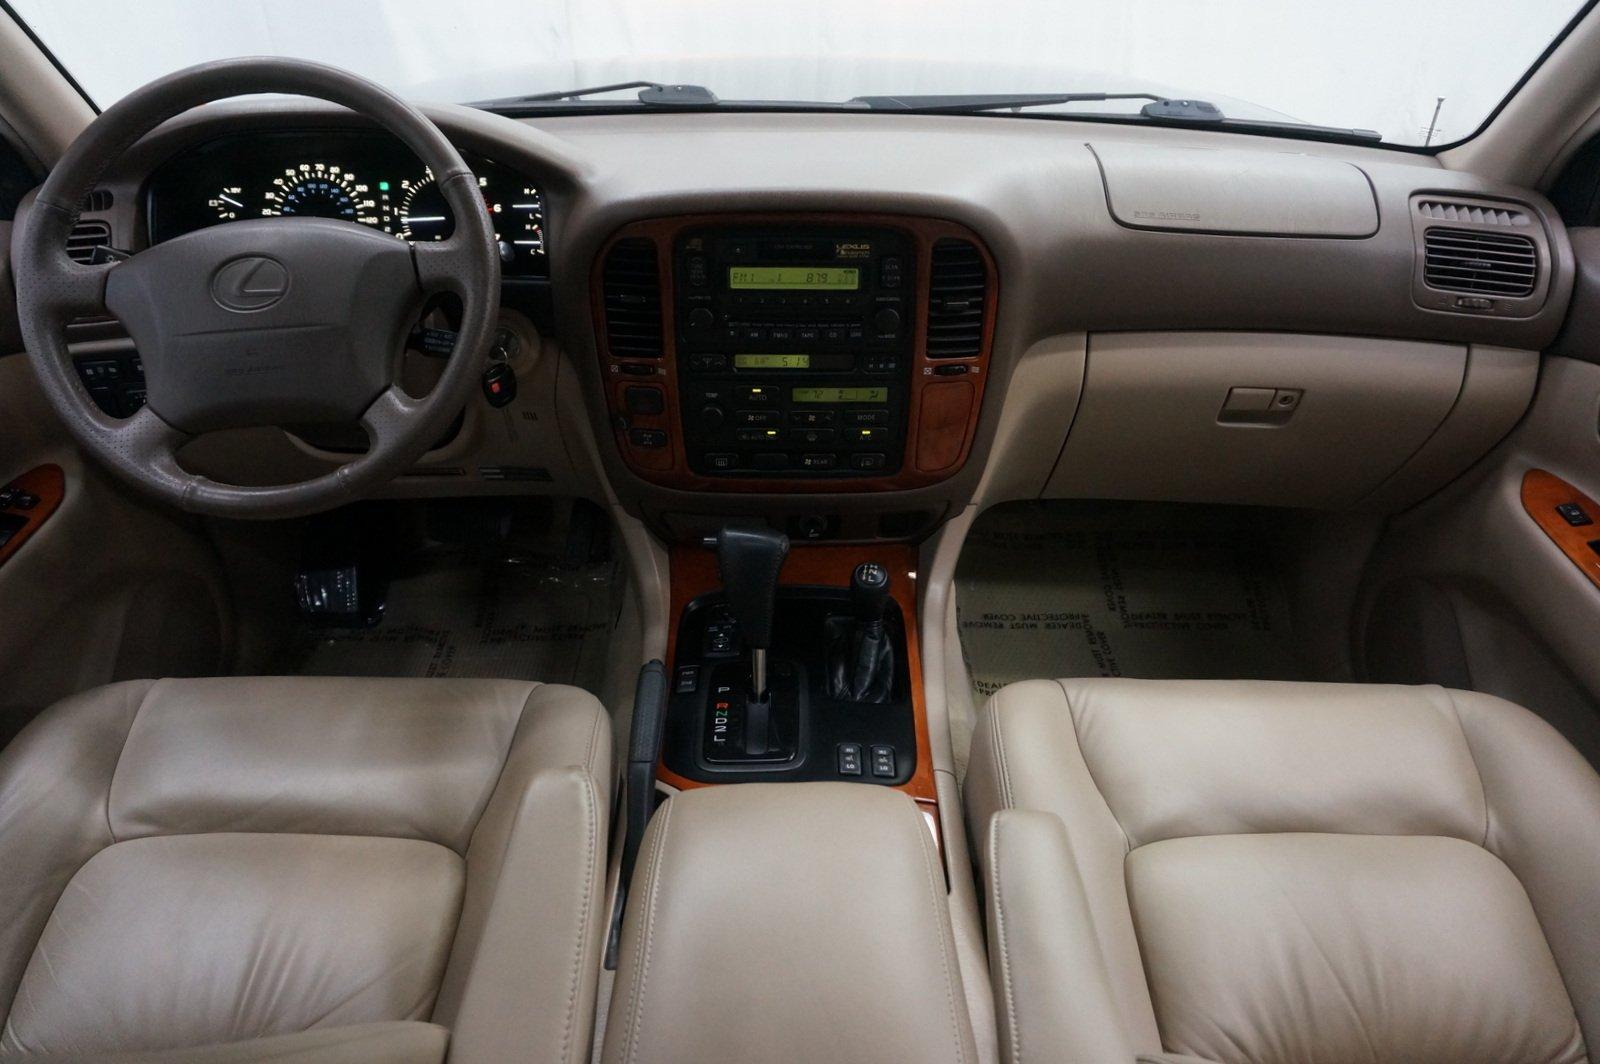 22+ 1999 Lexus Lx470 Stereo Upgrade